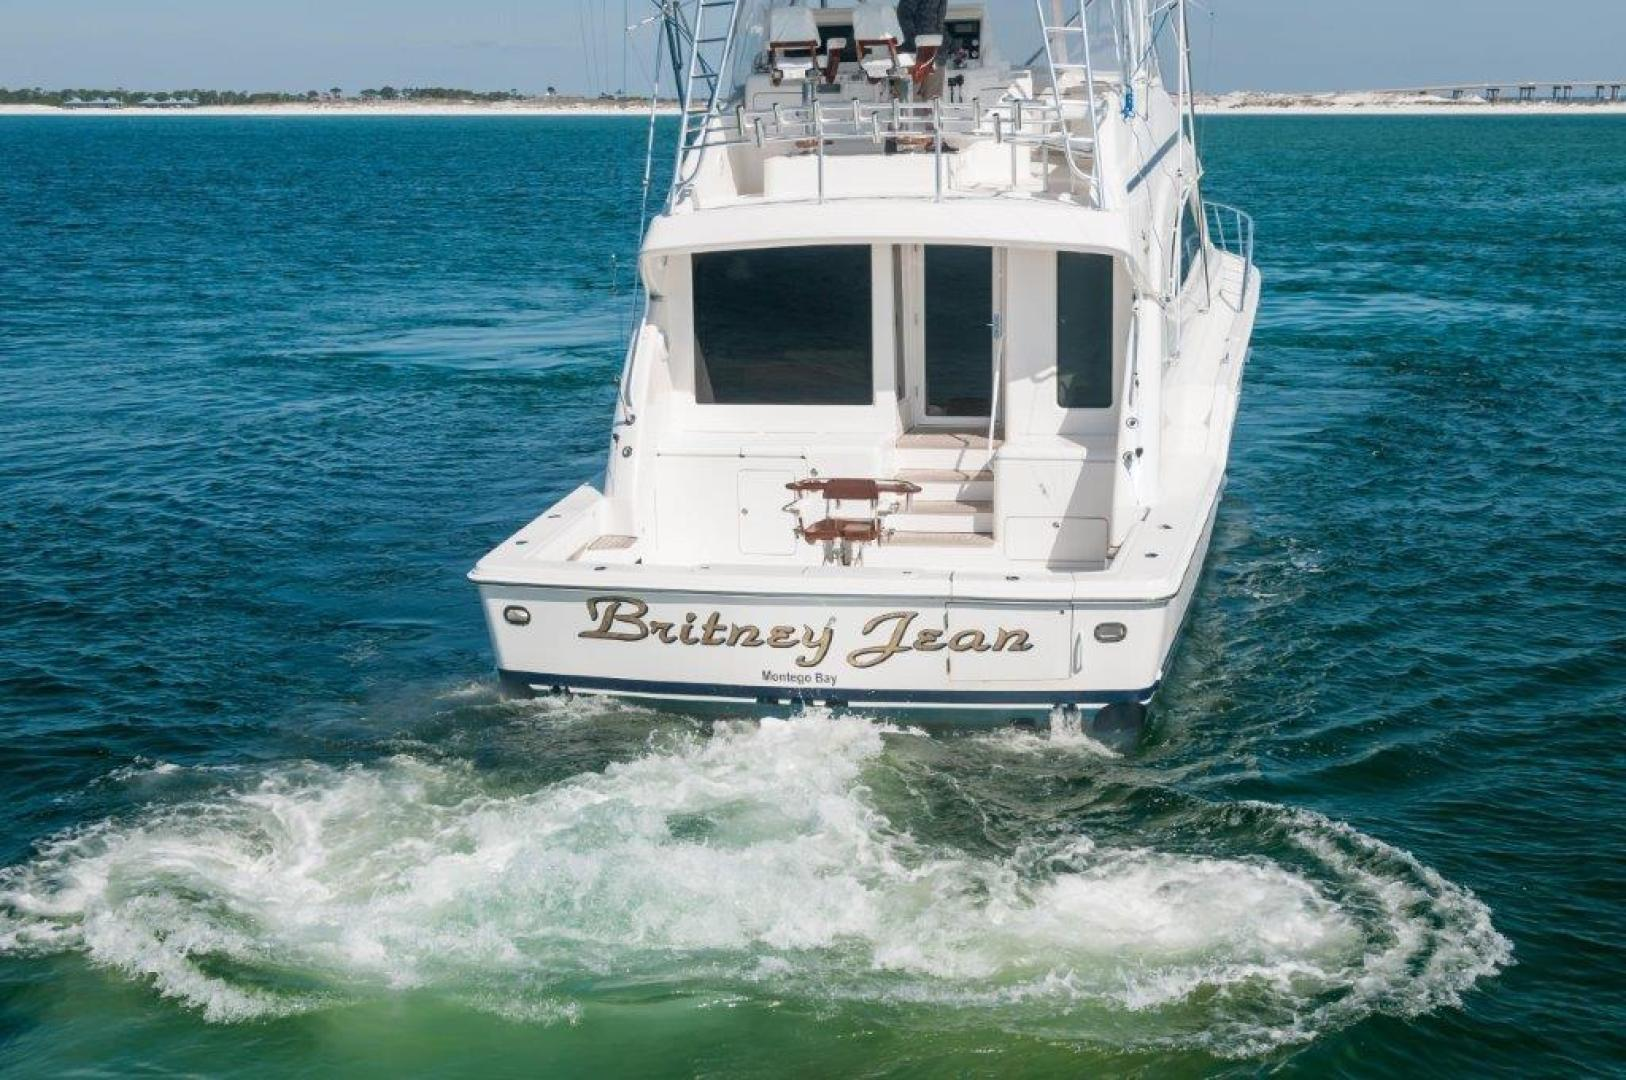 Bertram-67 Convertible 2003-Brittany Jean Destin-Florida-United States-2003 67 Bertram Convertible Brittany Jean Transom-720500 | Thumbnail